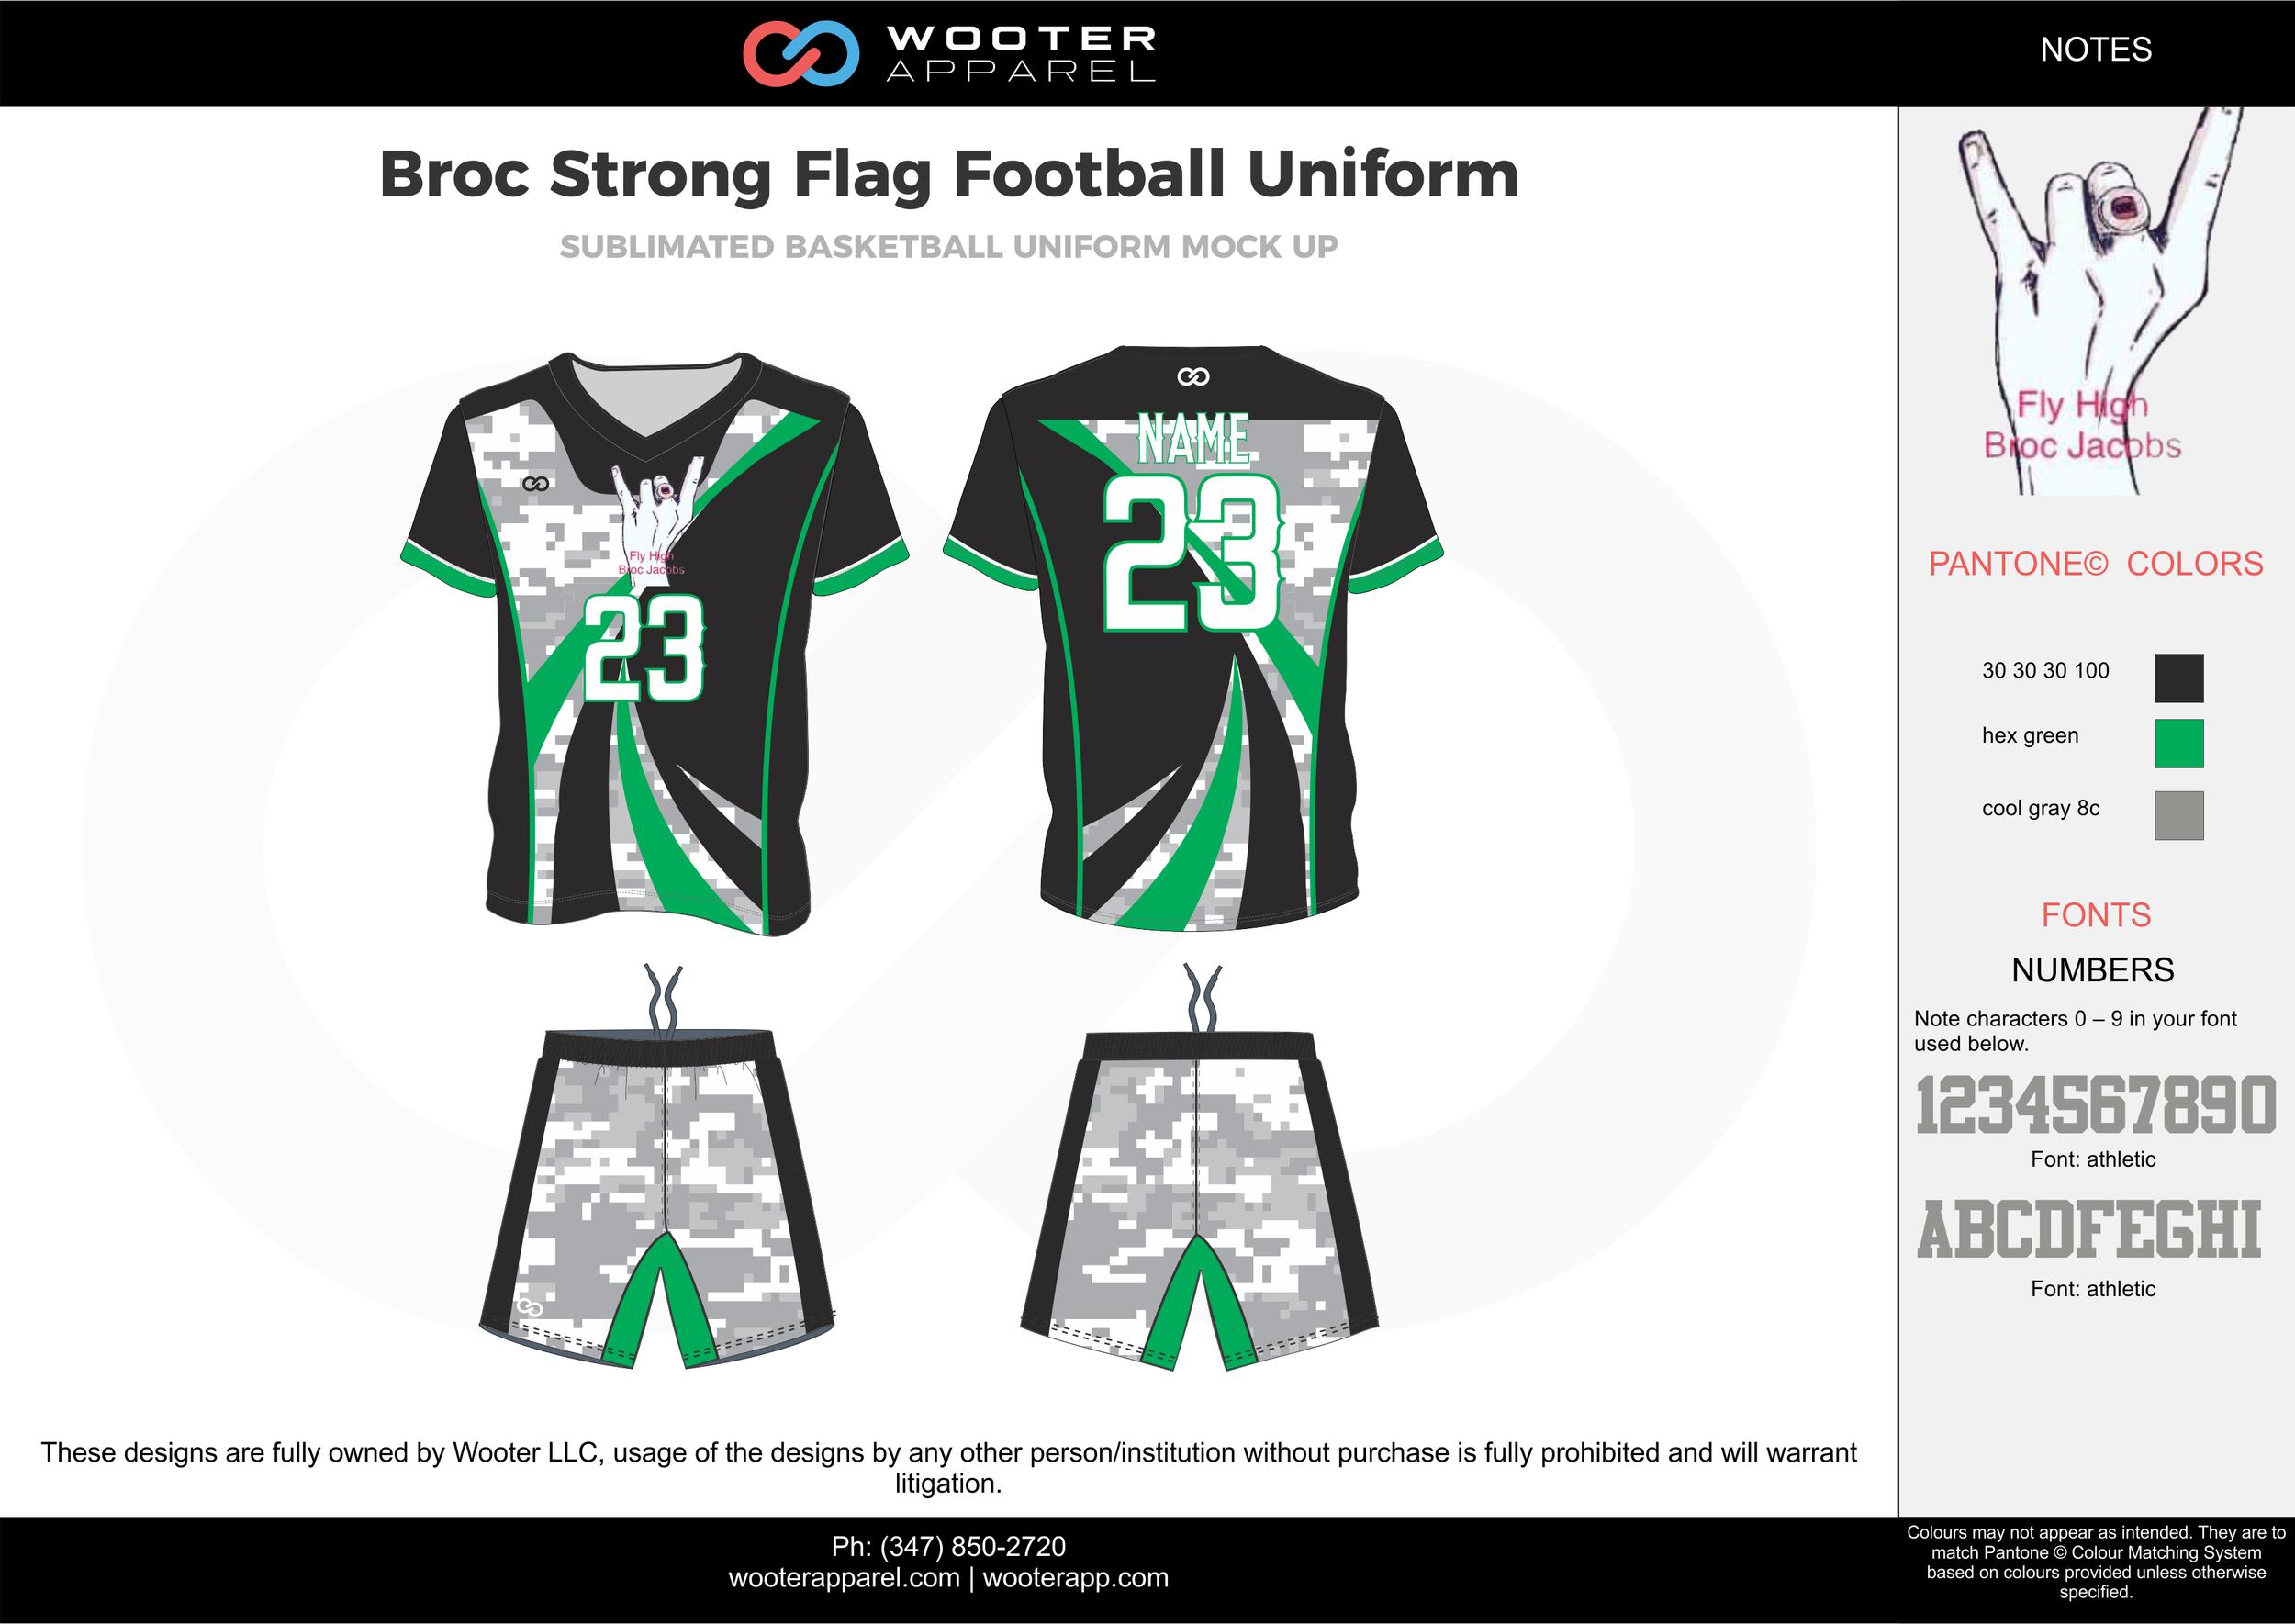 Broc Strong Flag black green gray white football uniforms jerseys shorts